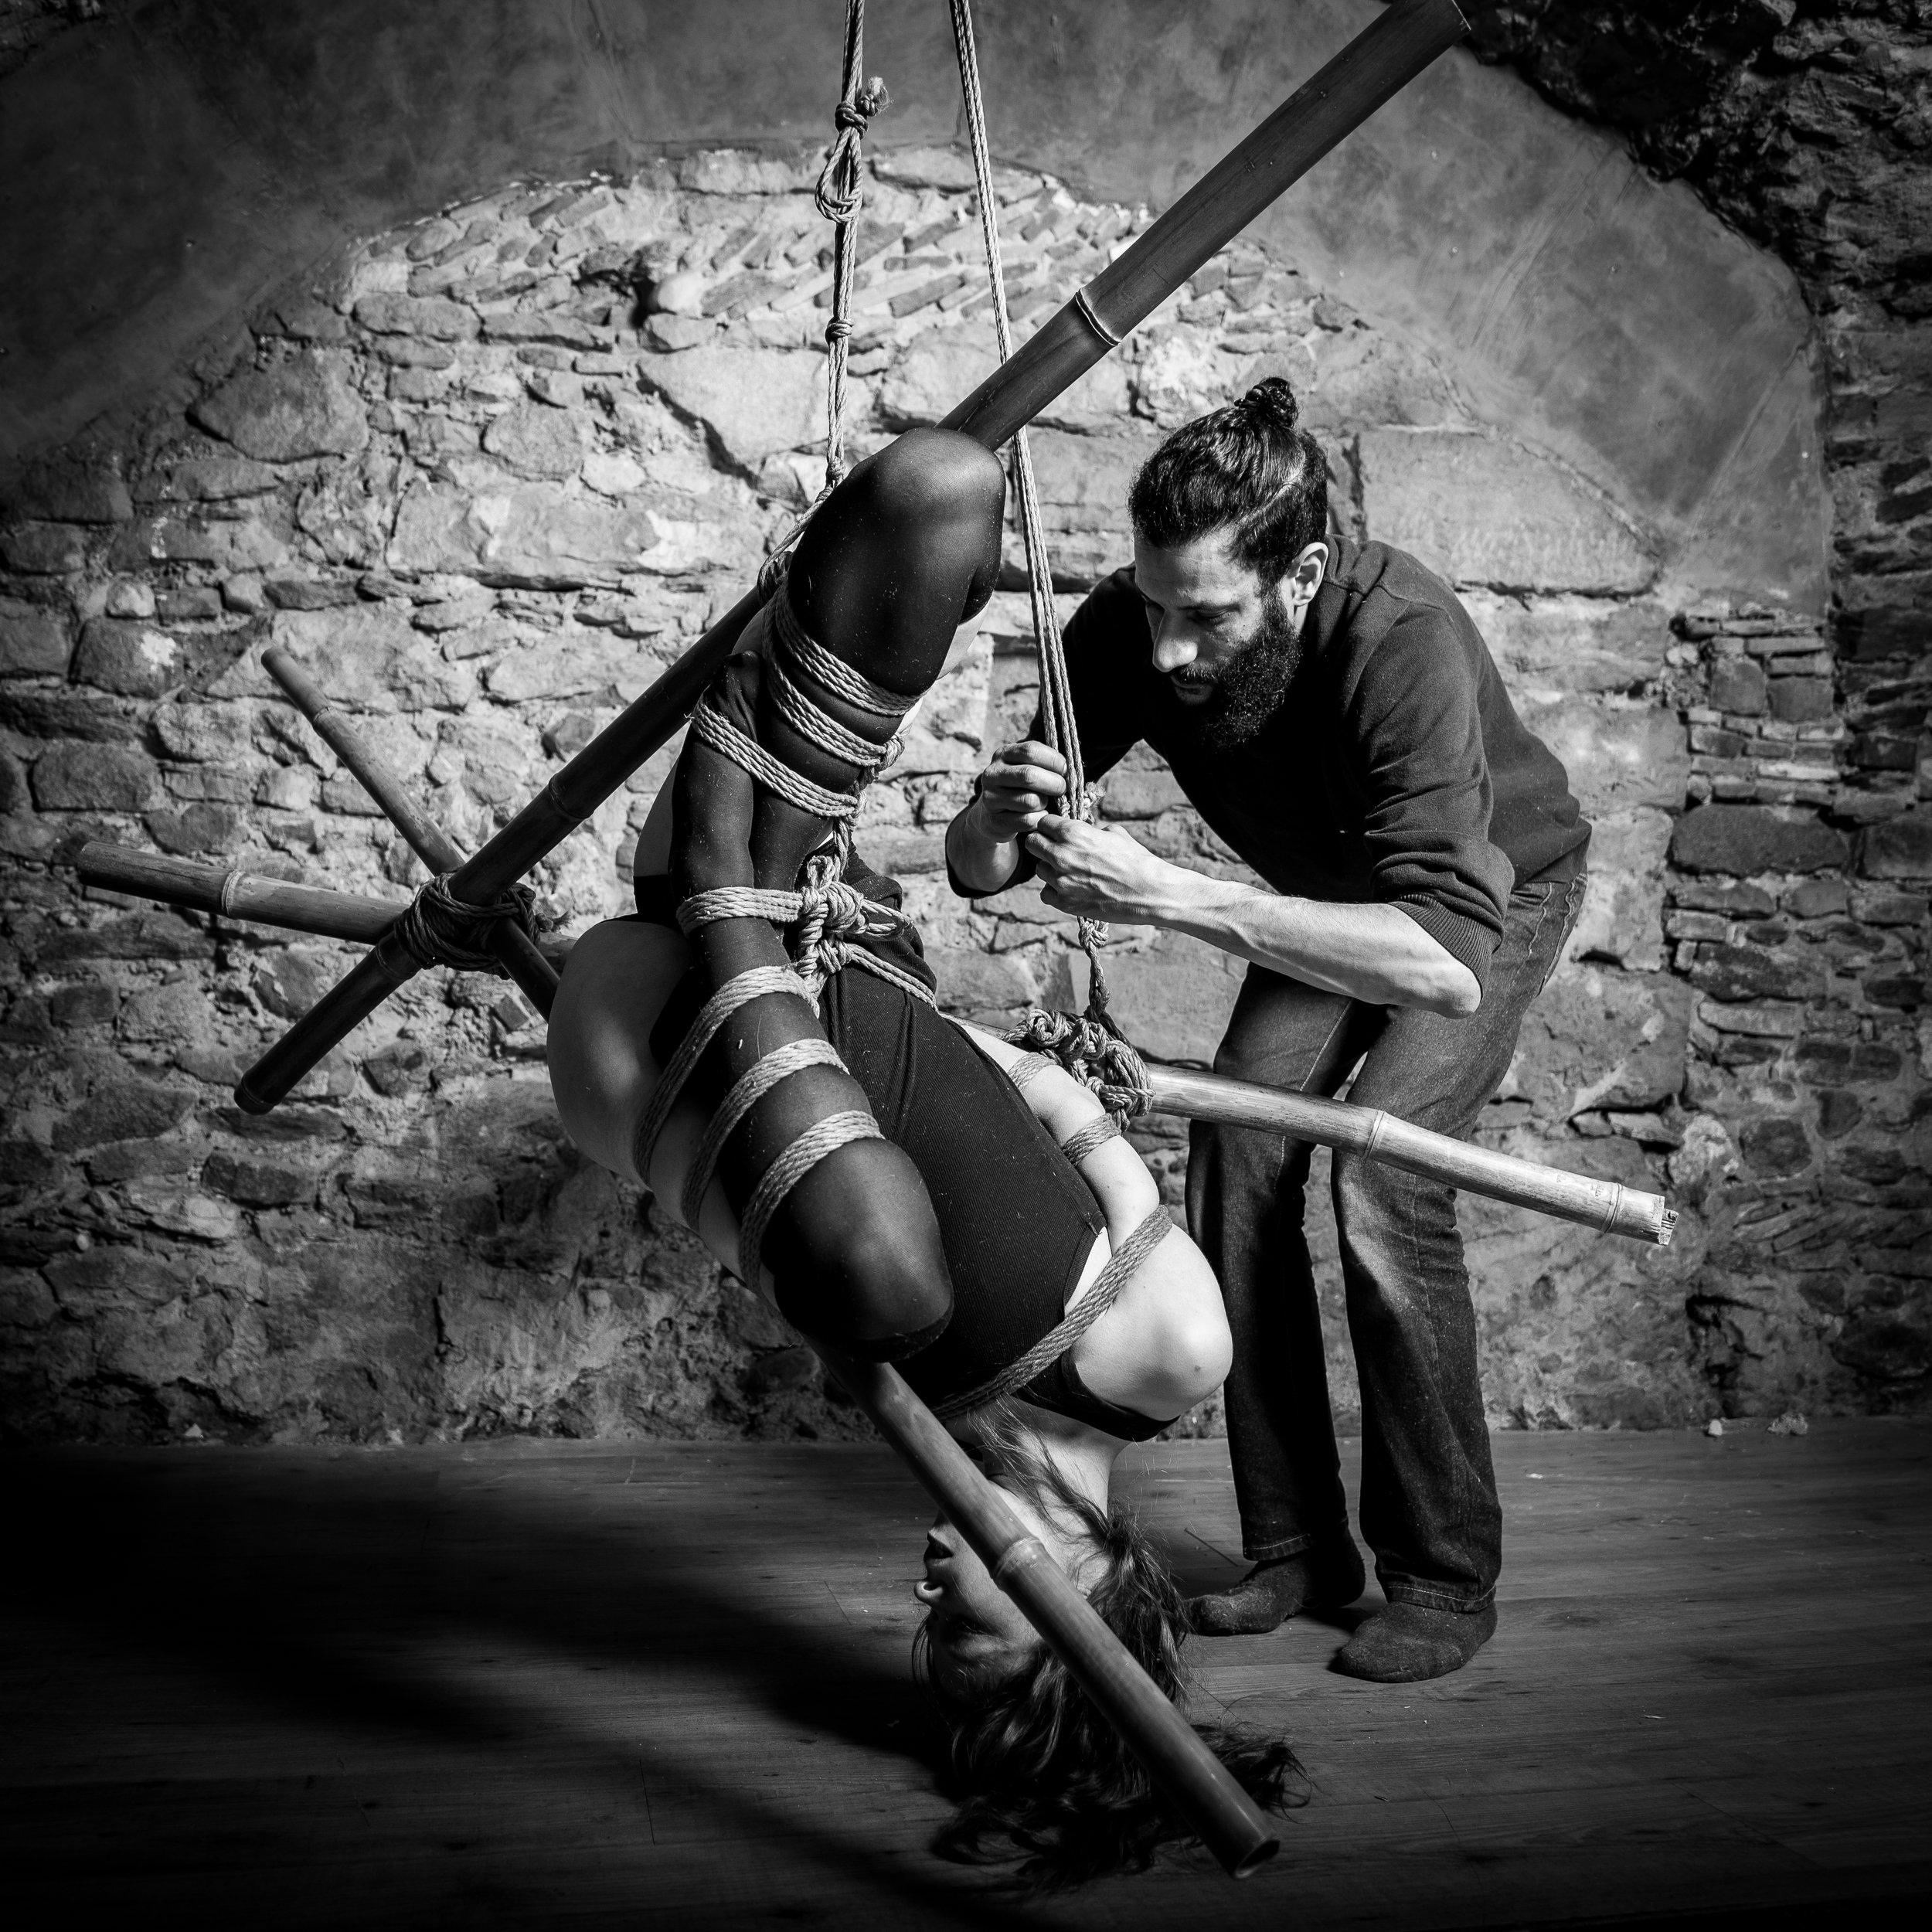 Justin Rvt - Lyon, FranceWorkshops // TuitionPerformance // Artistic Workemail // fetlife // insta // facebookropework: Justin Rvtphoto: Pyrrhus Roi D'Épiremodelling: Gwen Sh